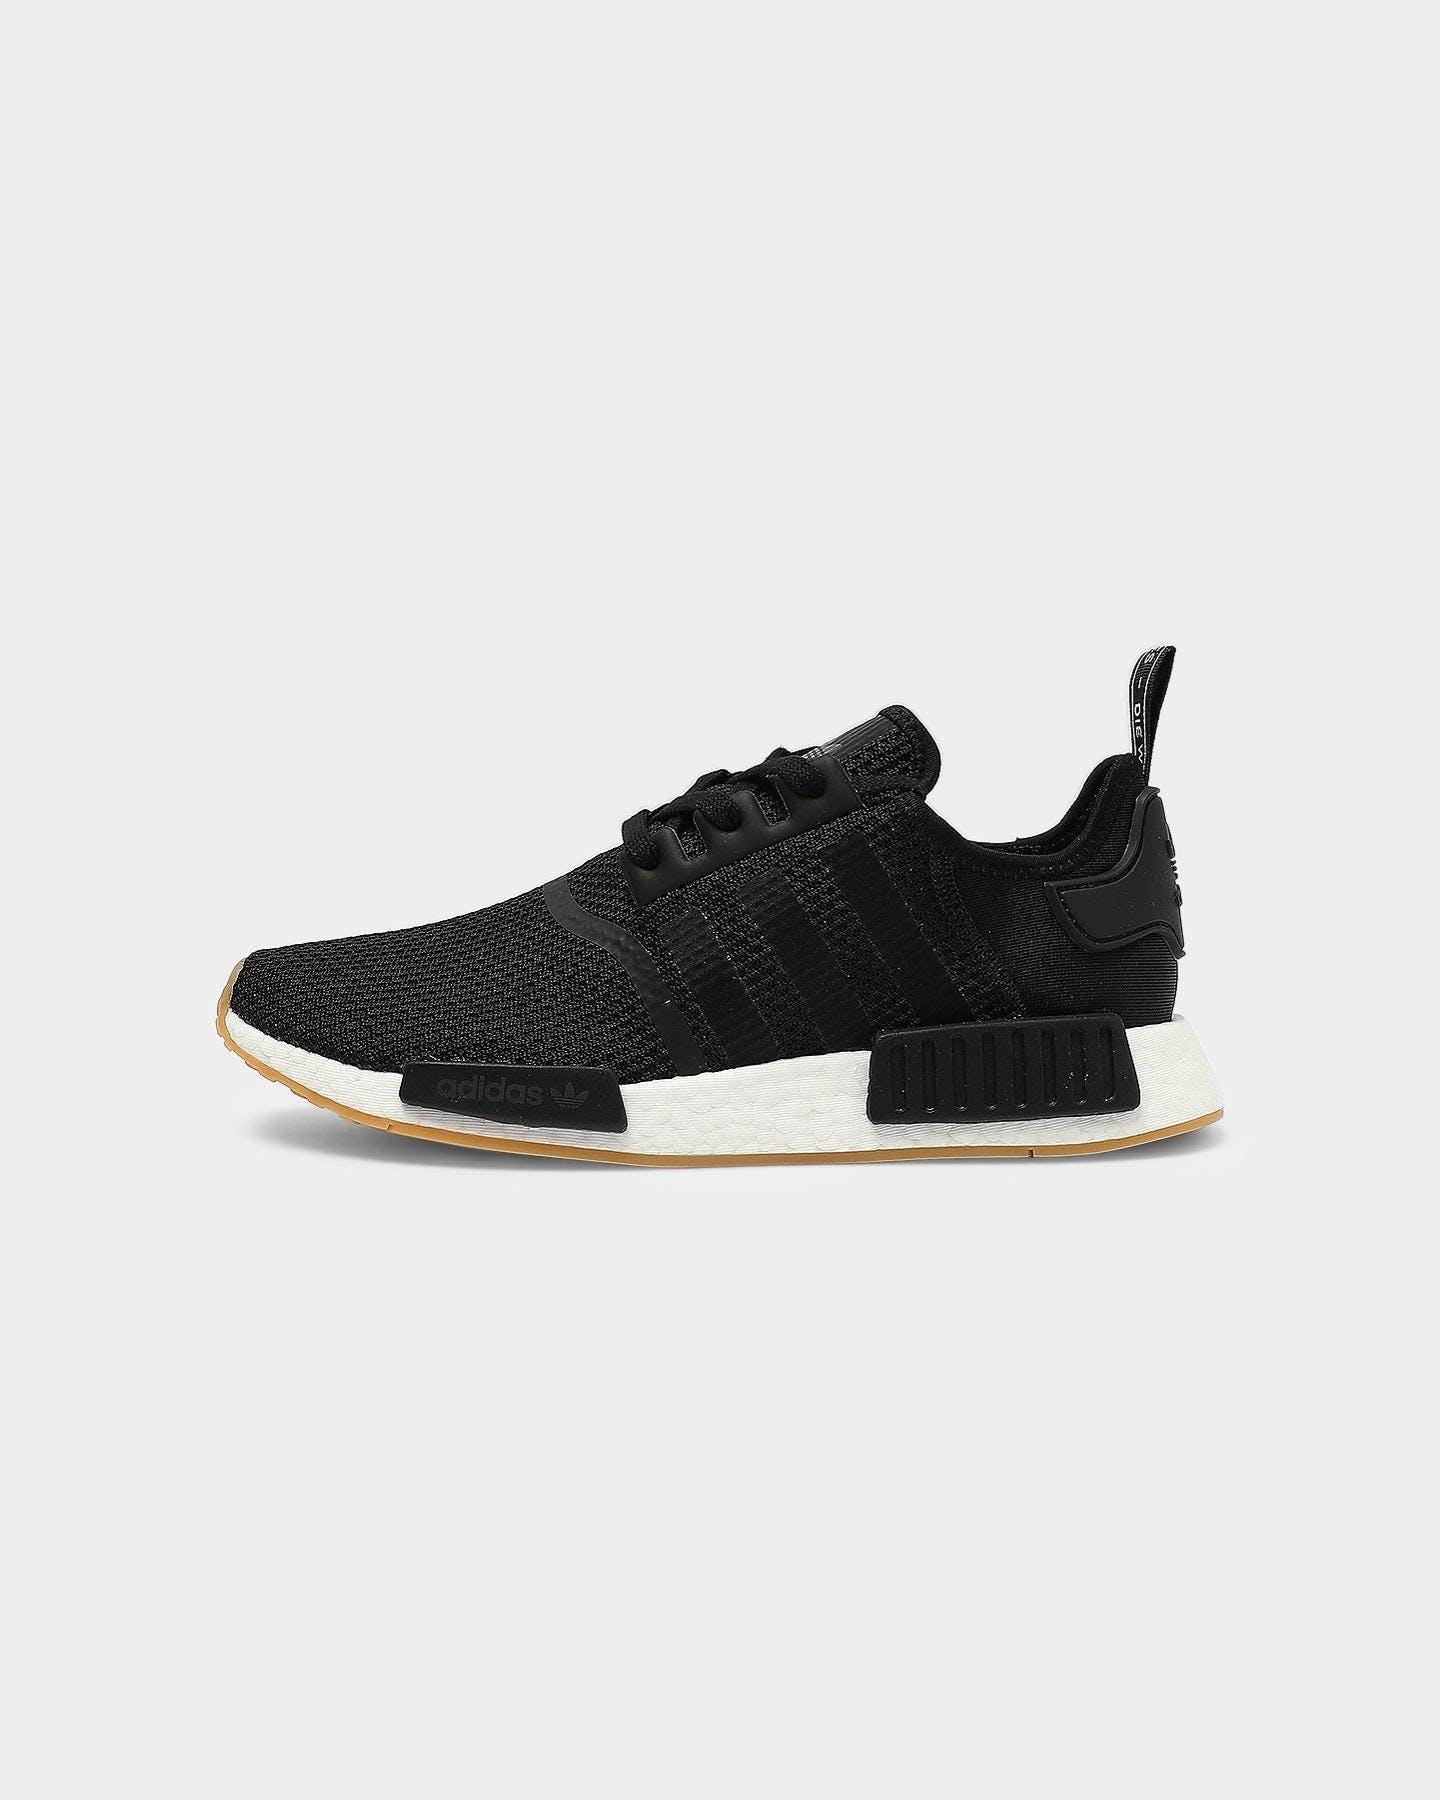 Adidas Nmd R1 Black White Gum Culture Kings Us